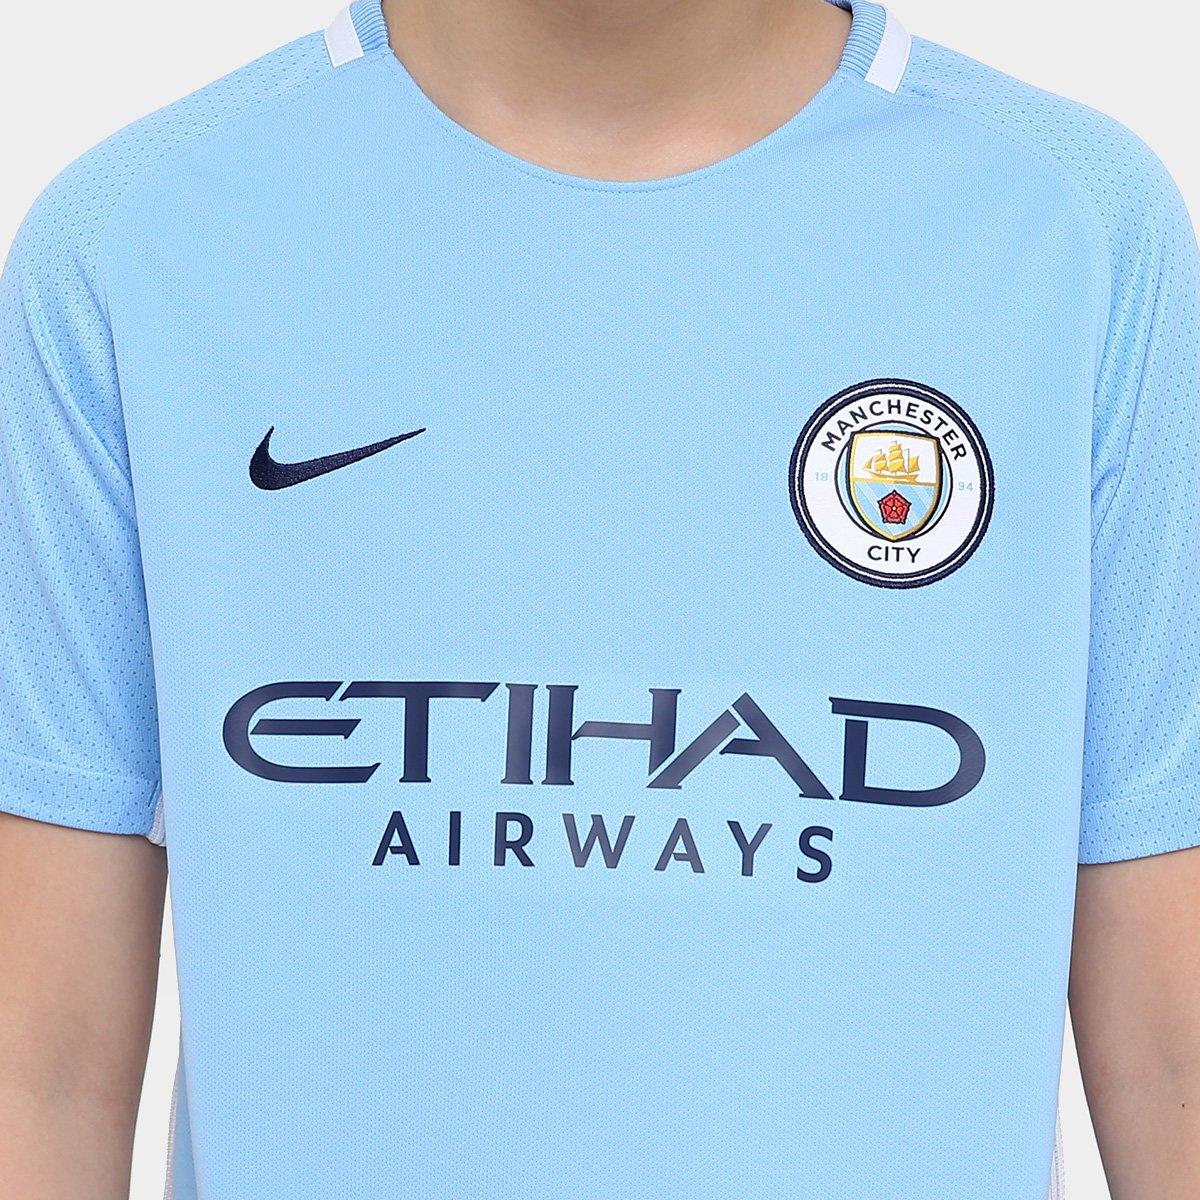 ... Camisa Manchester City Juvenil Home 17 18 s nº Torcedor Nike ... 42ecde862f036